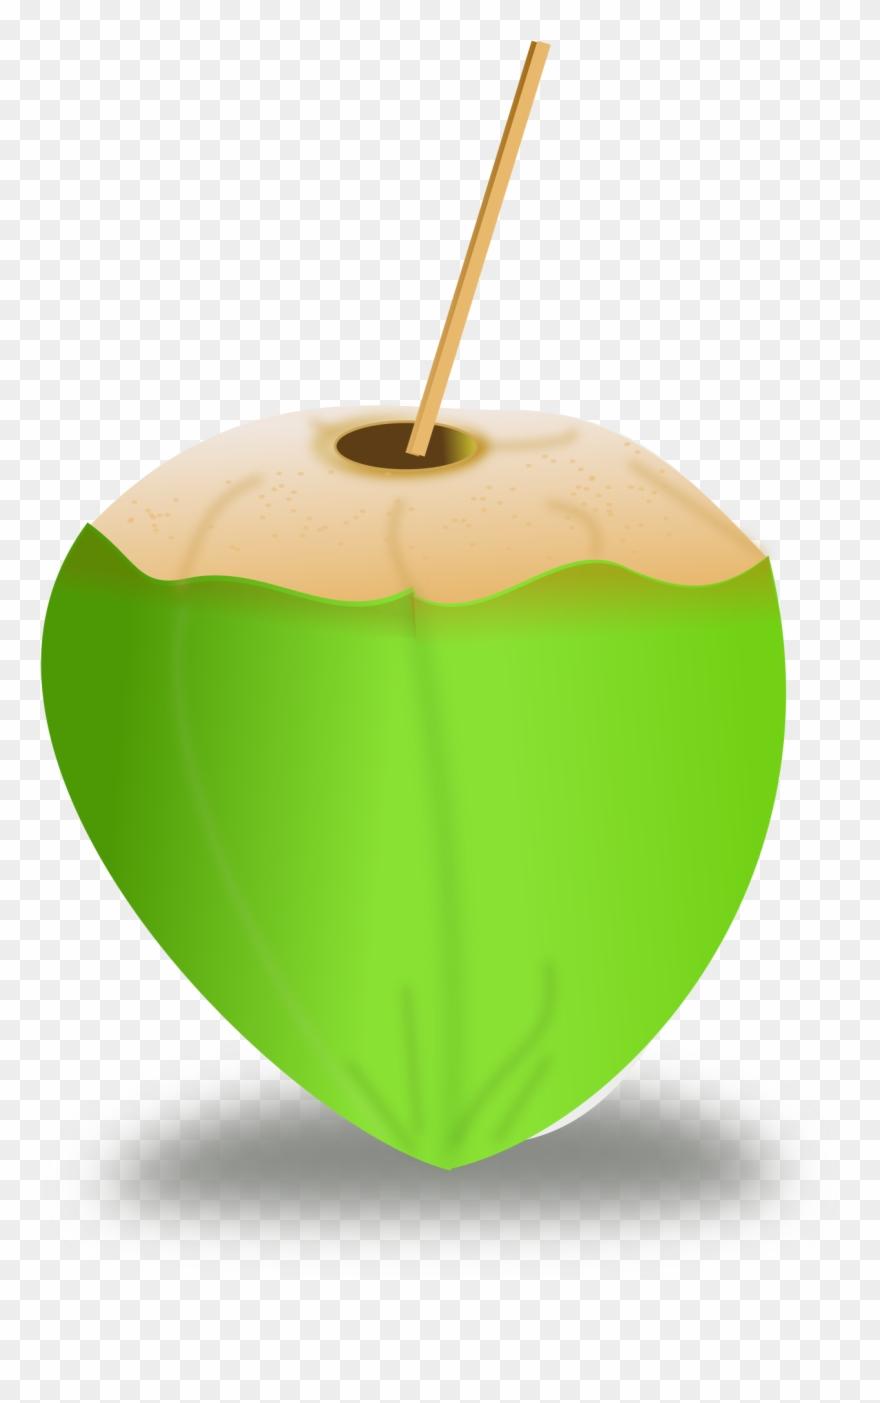 coconut # 4836612